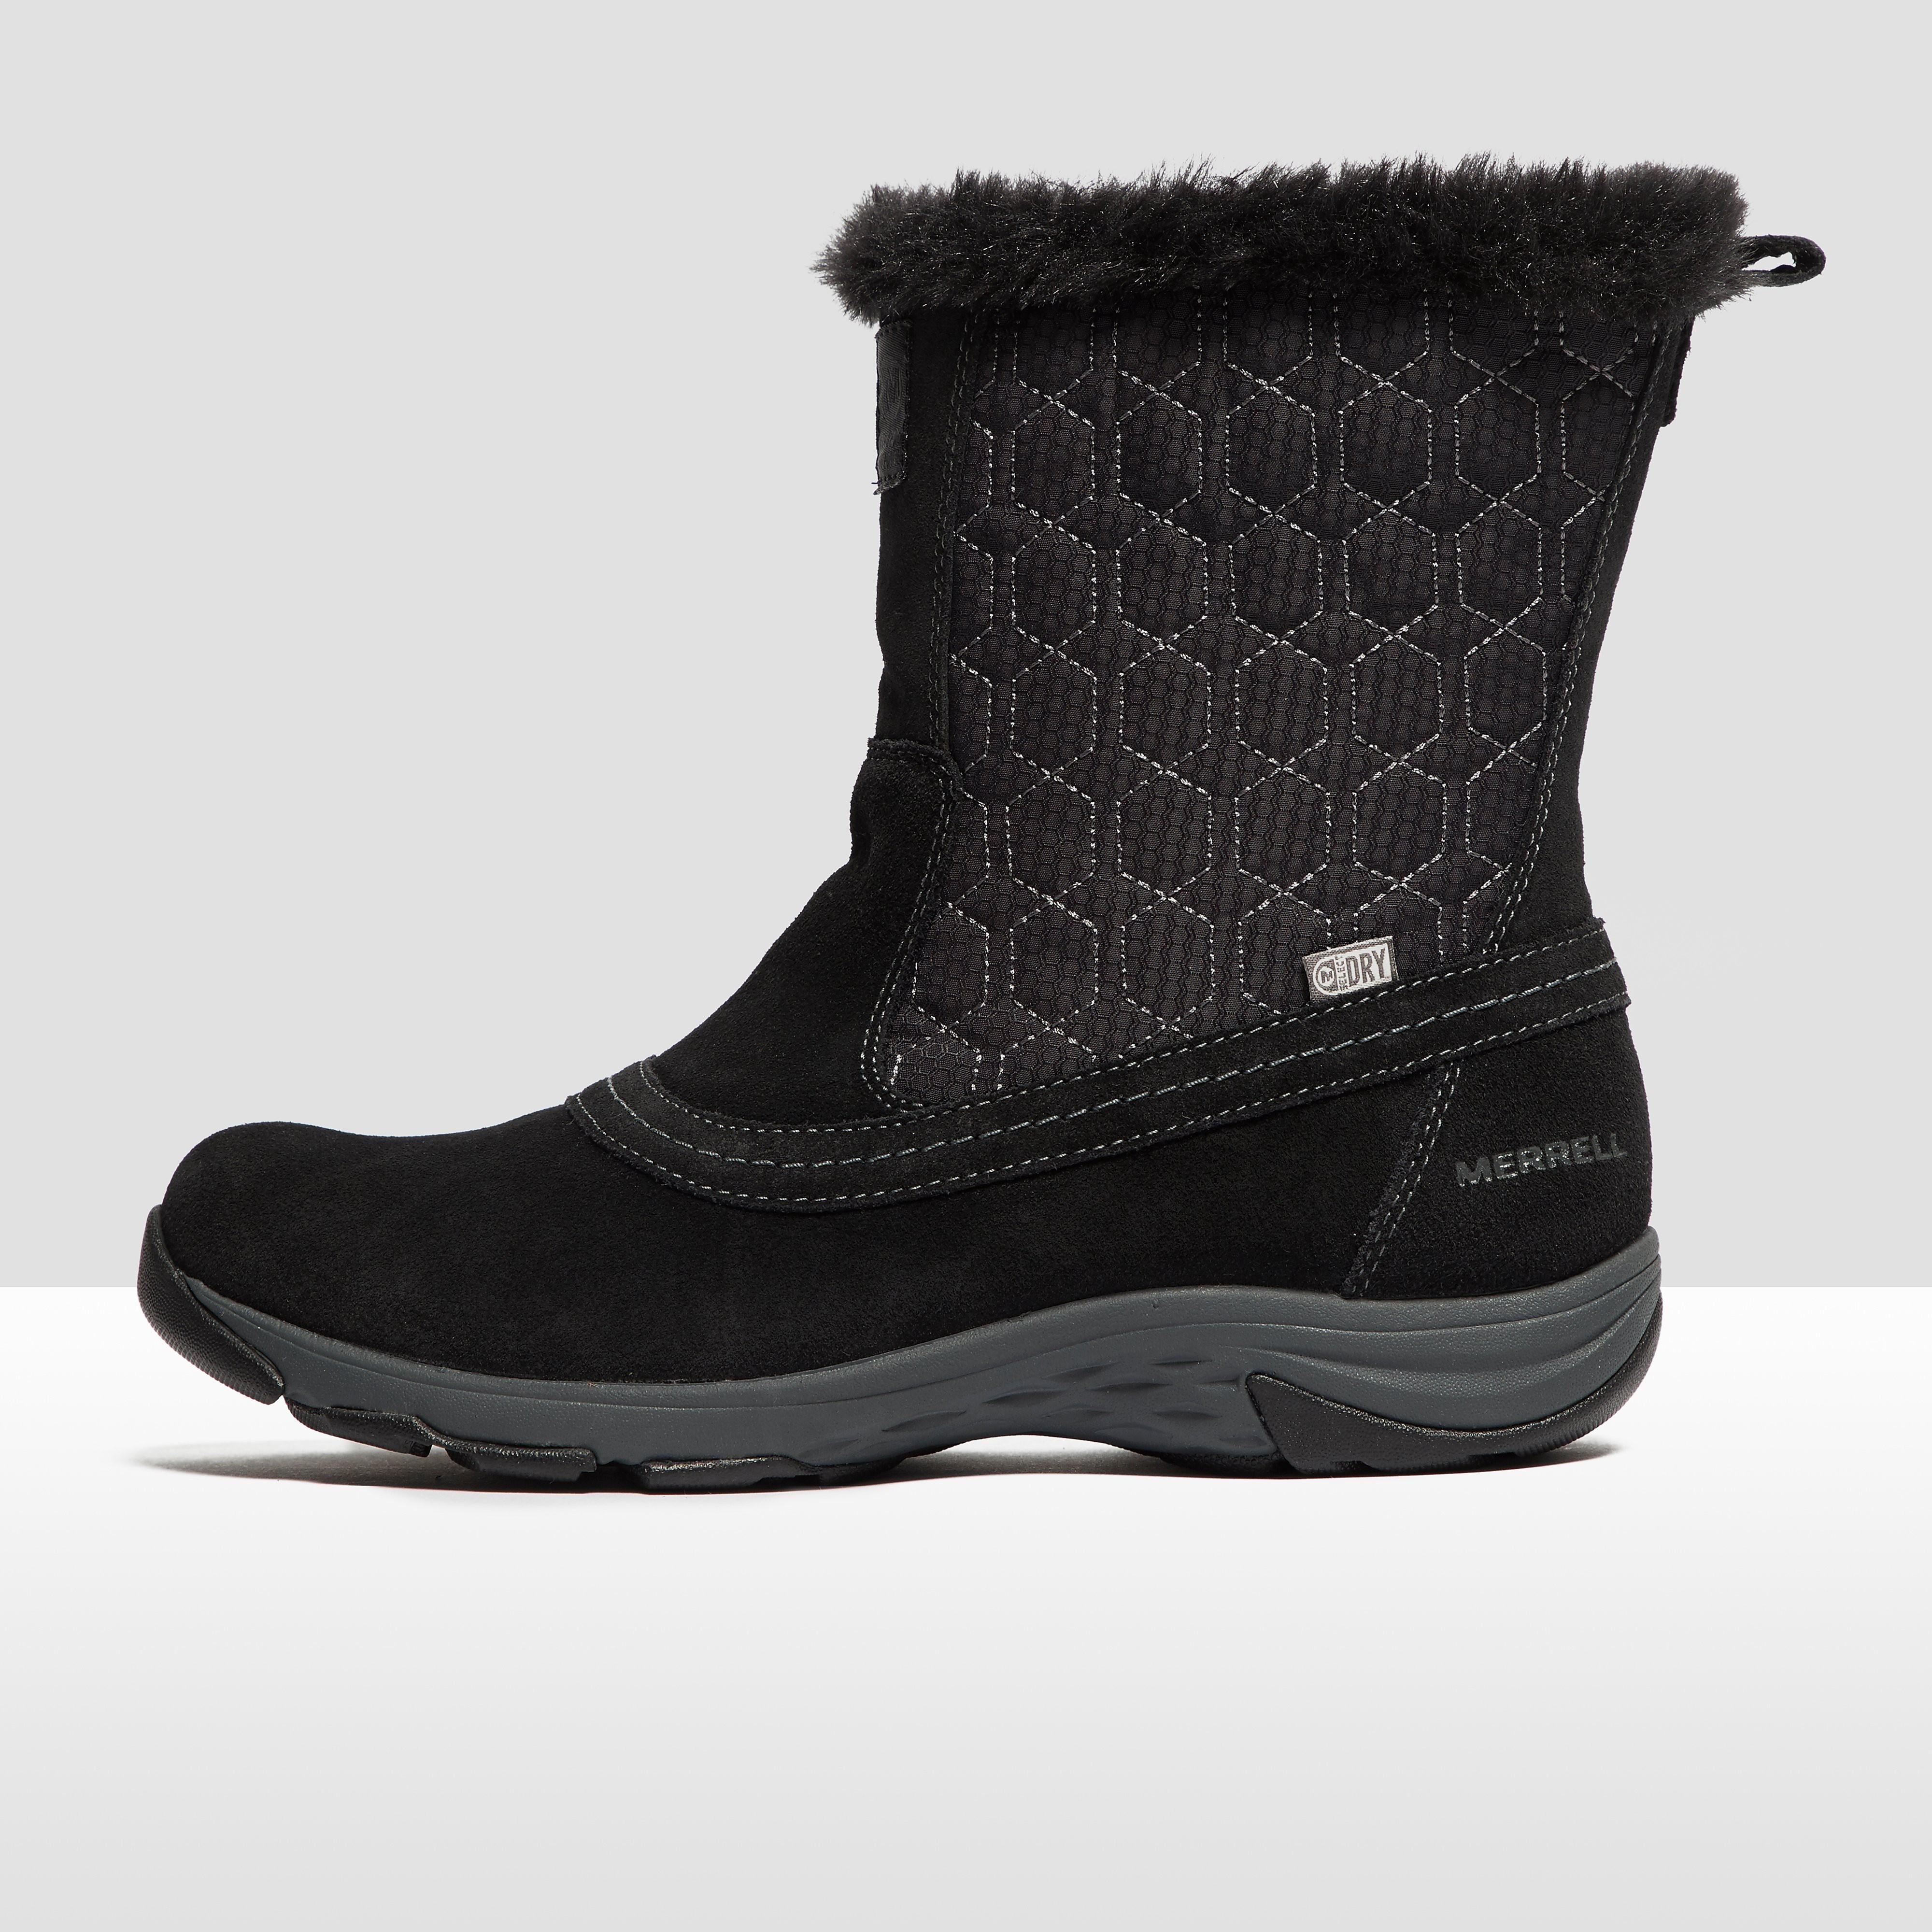 Merrell Ryeland Women's Tall Polar Waterproof Boots